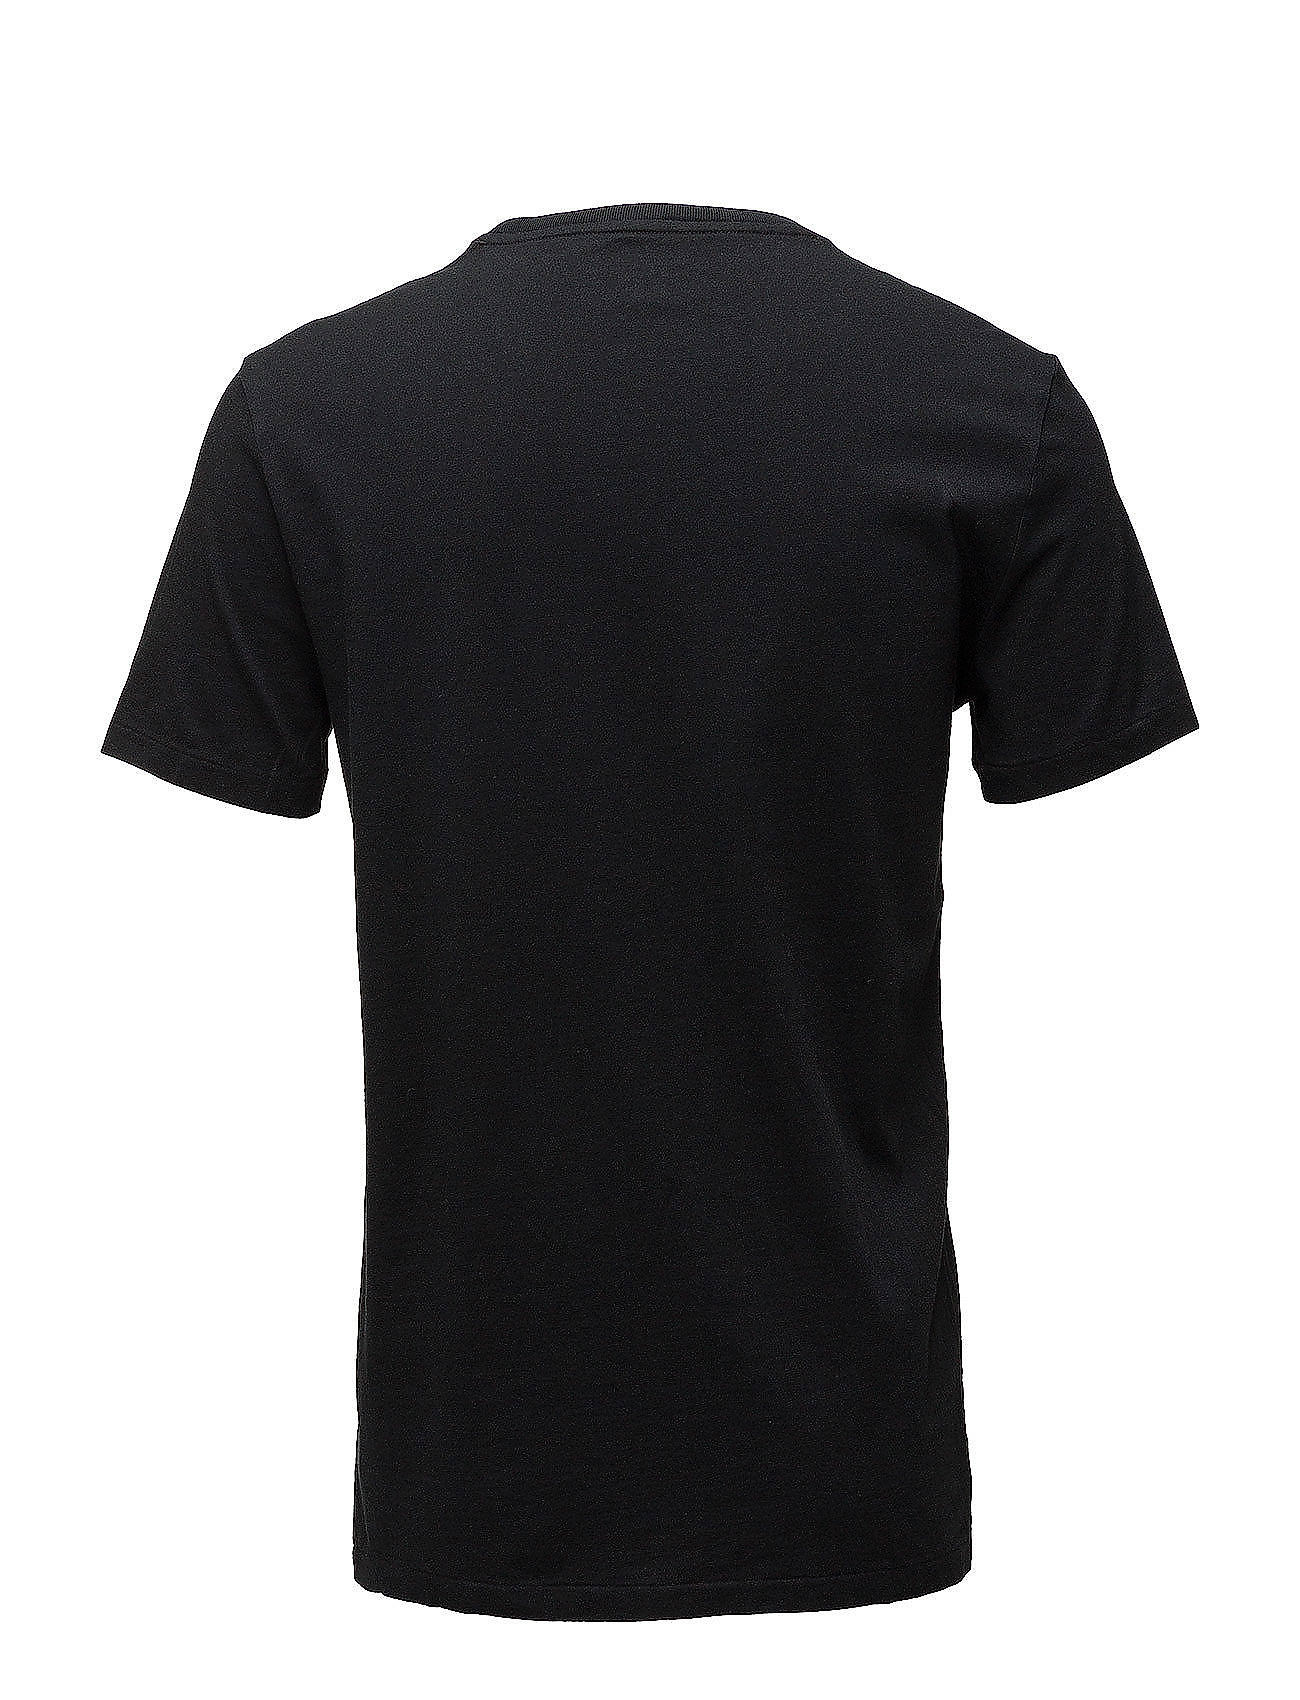 T Slim Cotton shirtrl BlackPolo Custom Ralph Lauren 4R5AjL